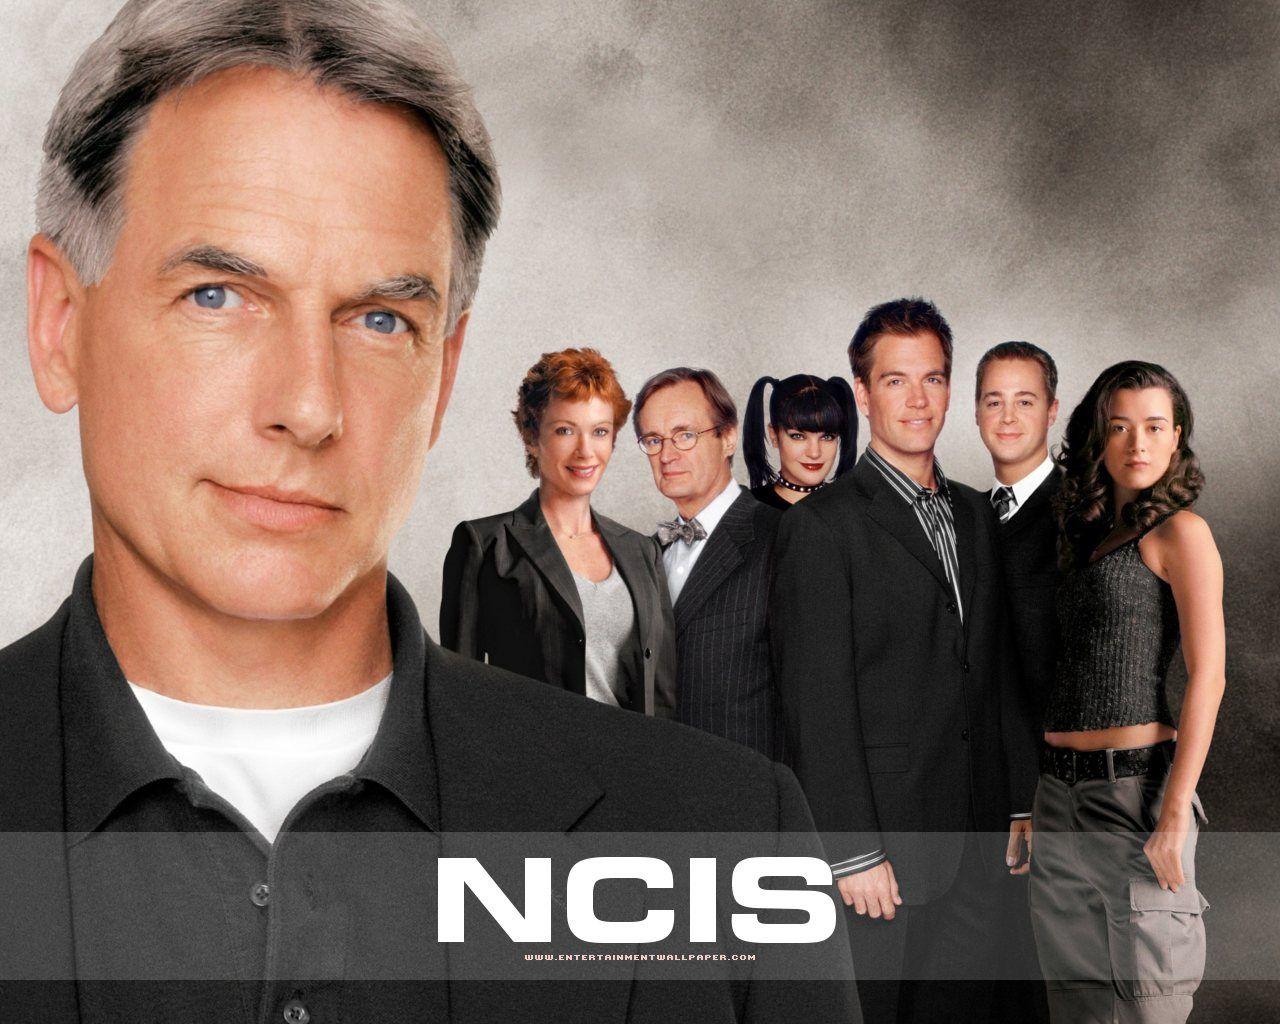 NCIS  fun show